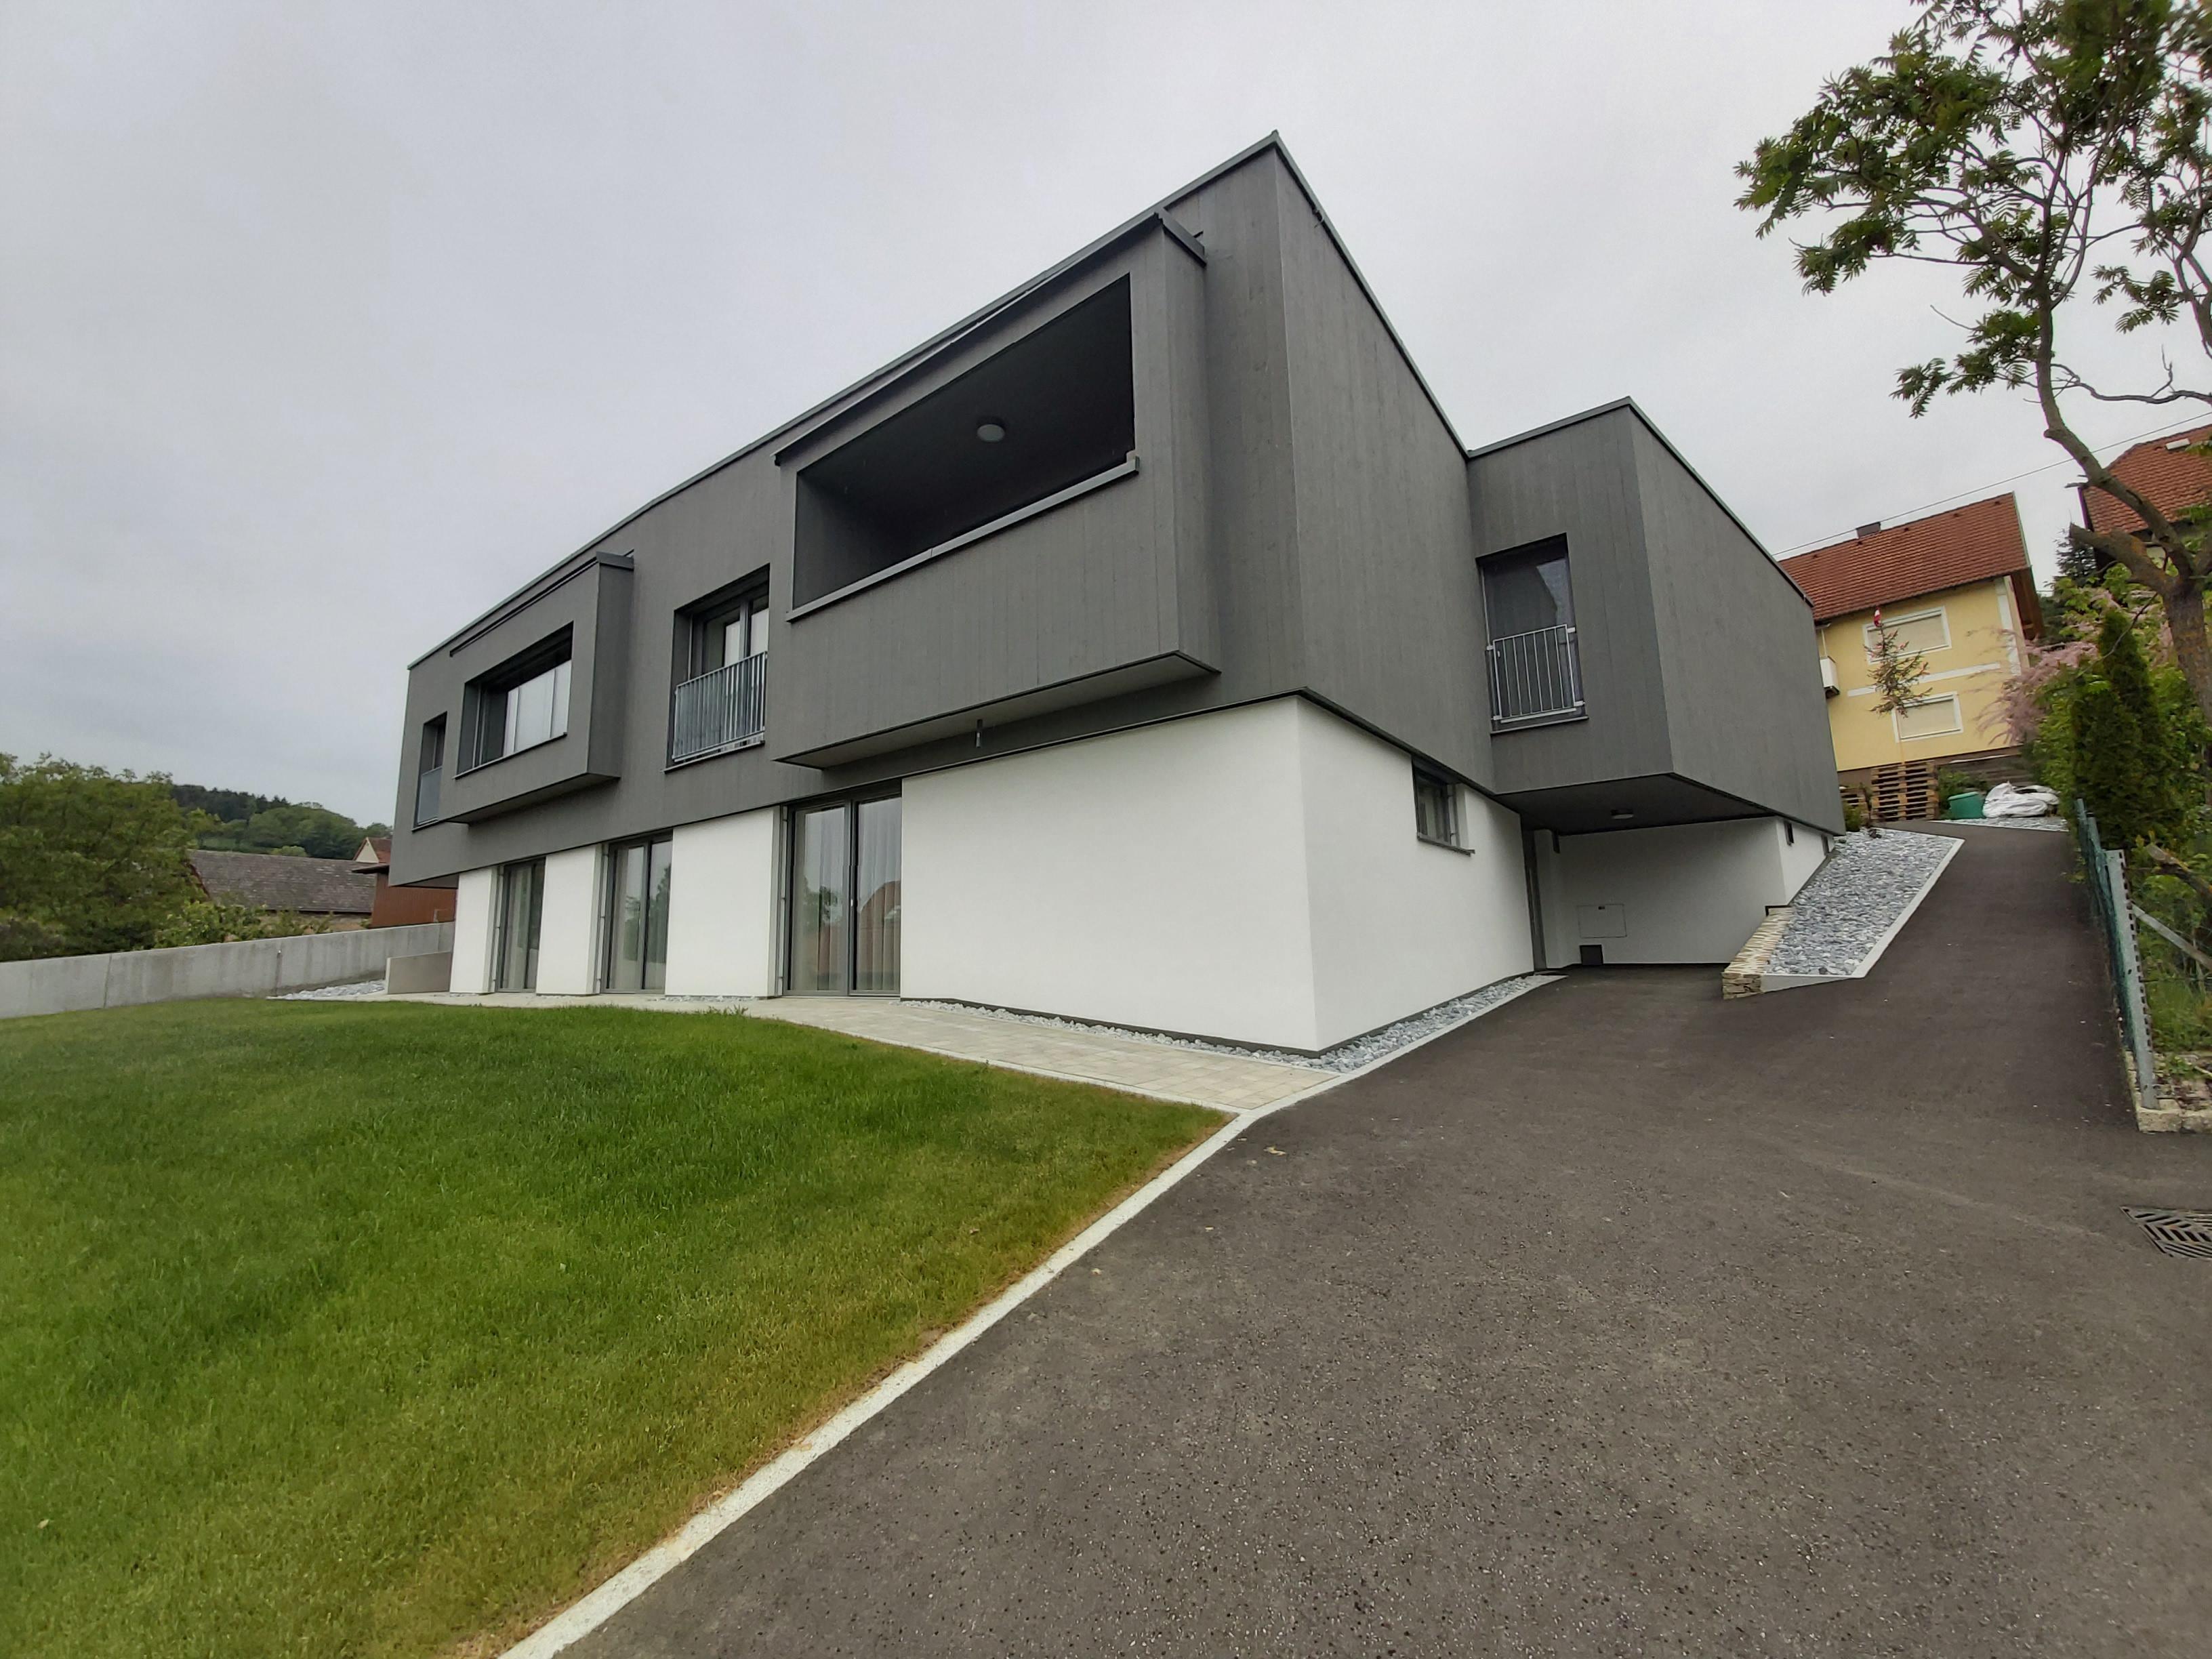 Zweifamilienhaus - VJ - Neubau